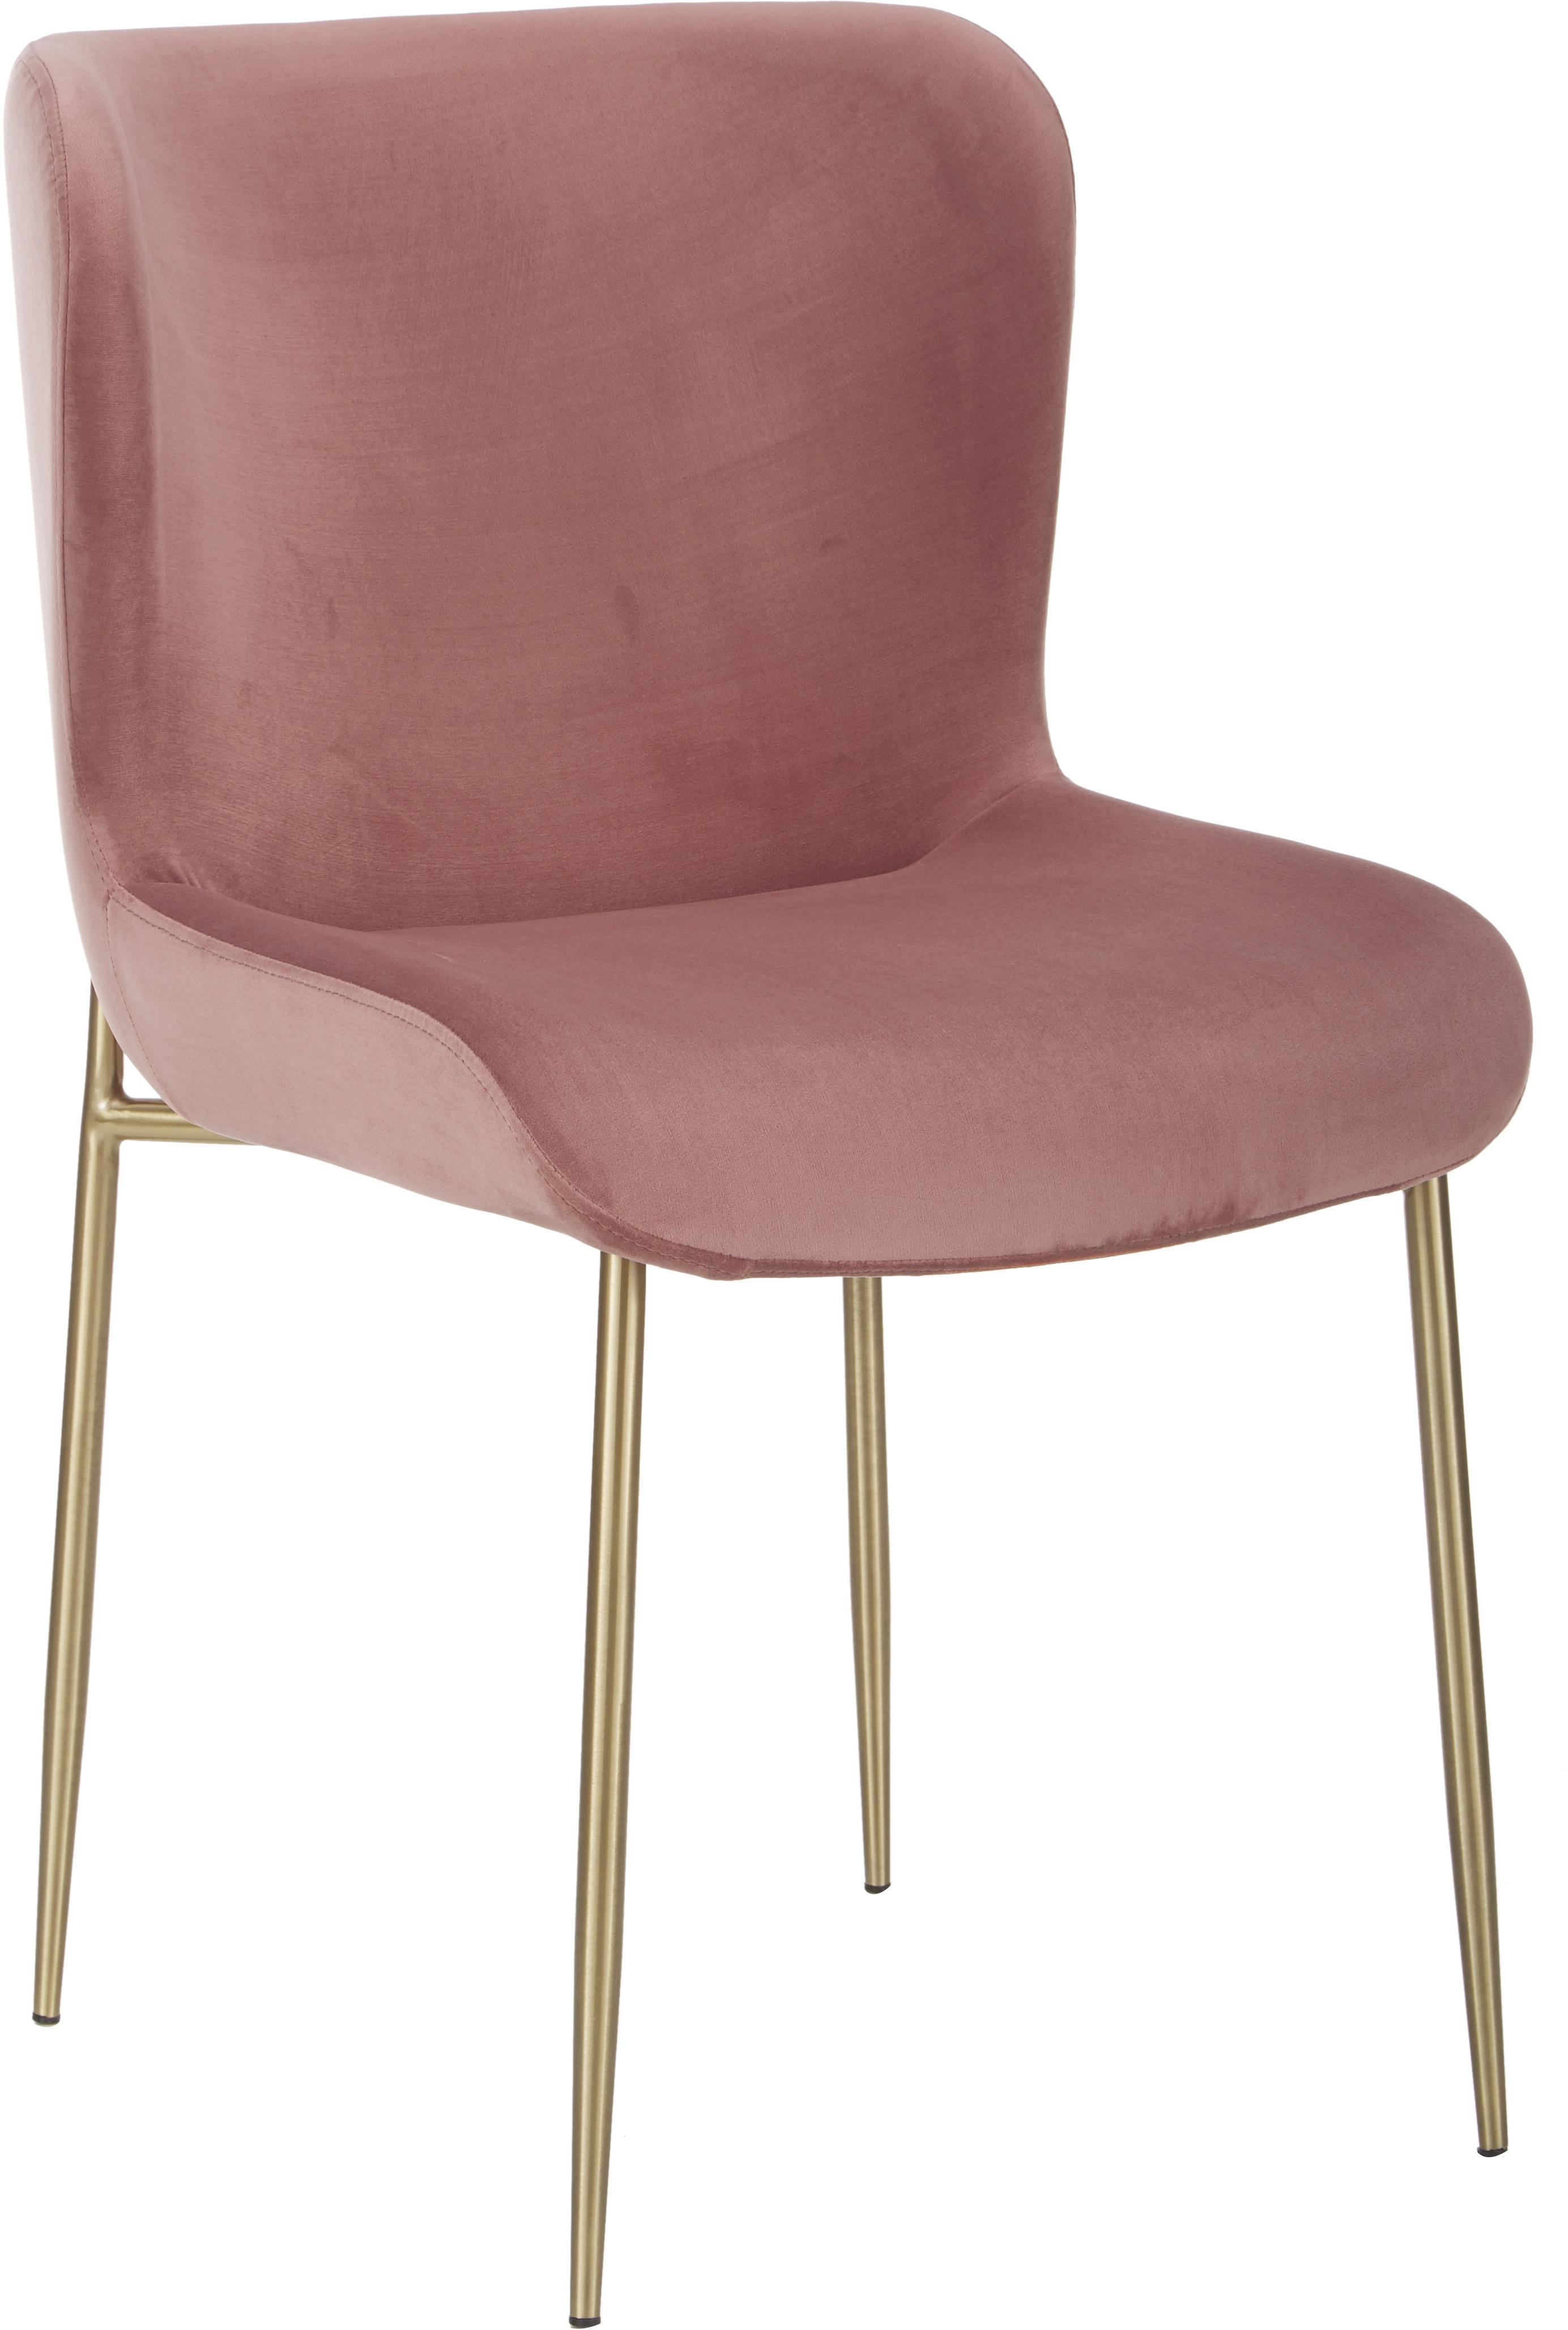 Fluwelen stoel Tess, Bekleding: fluweel (polyester), Poten: gecoat metaal, Fluweel oudroze, poten goudkleurig, B 48 x D 64 cm